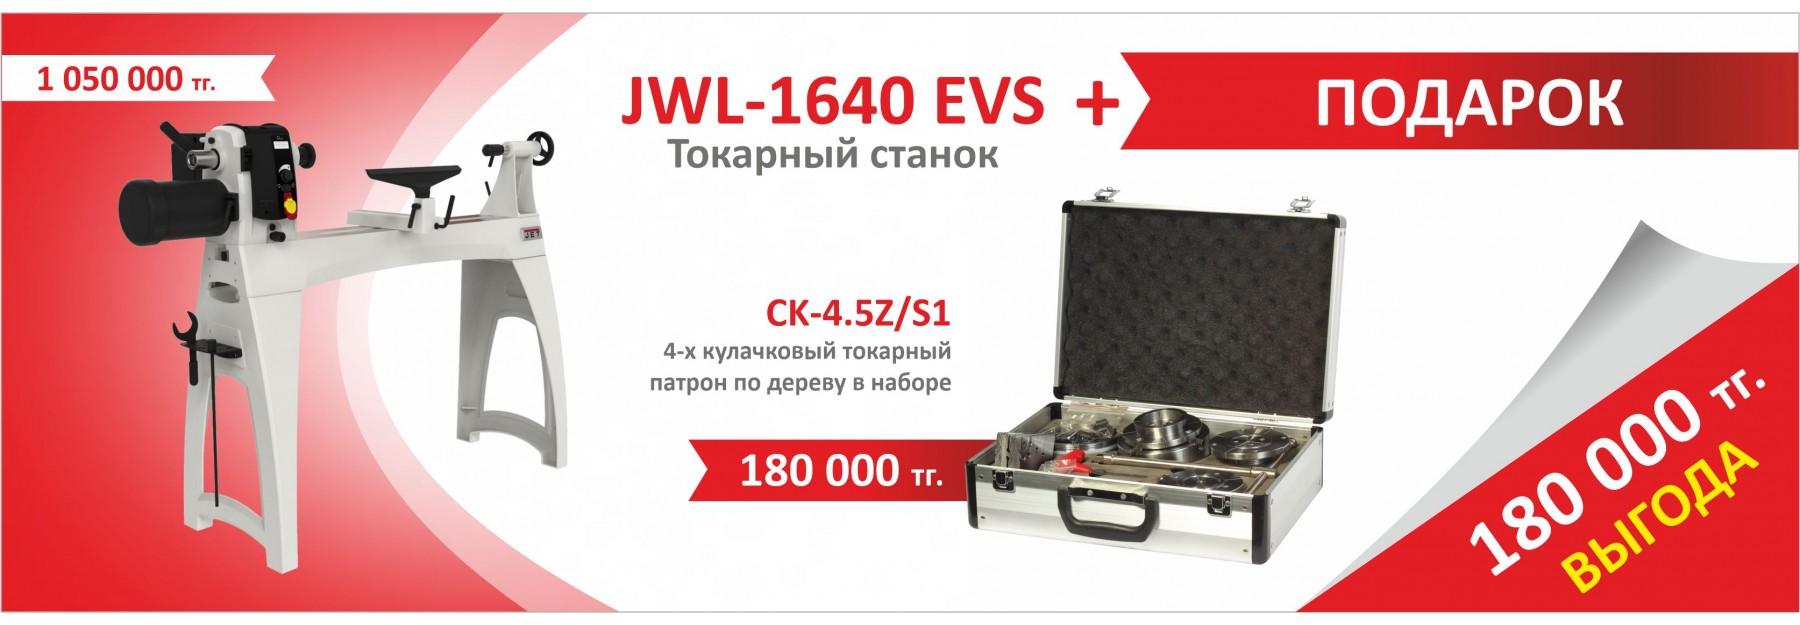 JWL-1640EVS